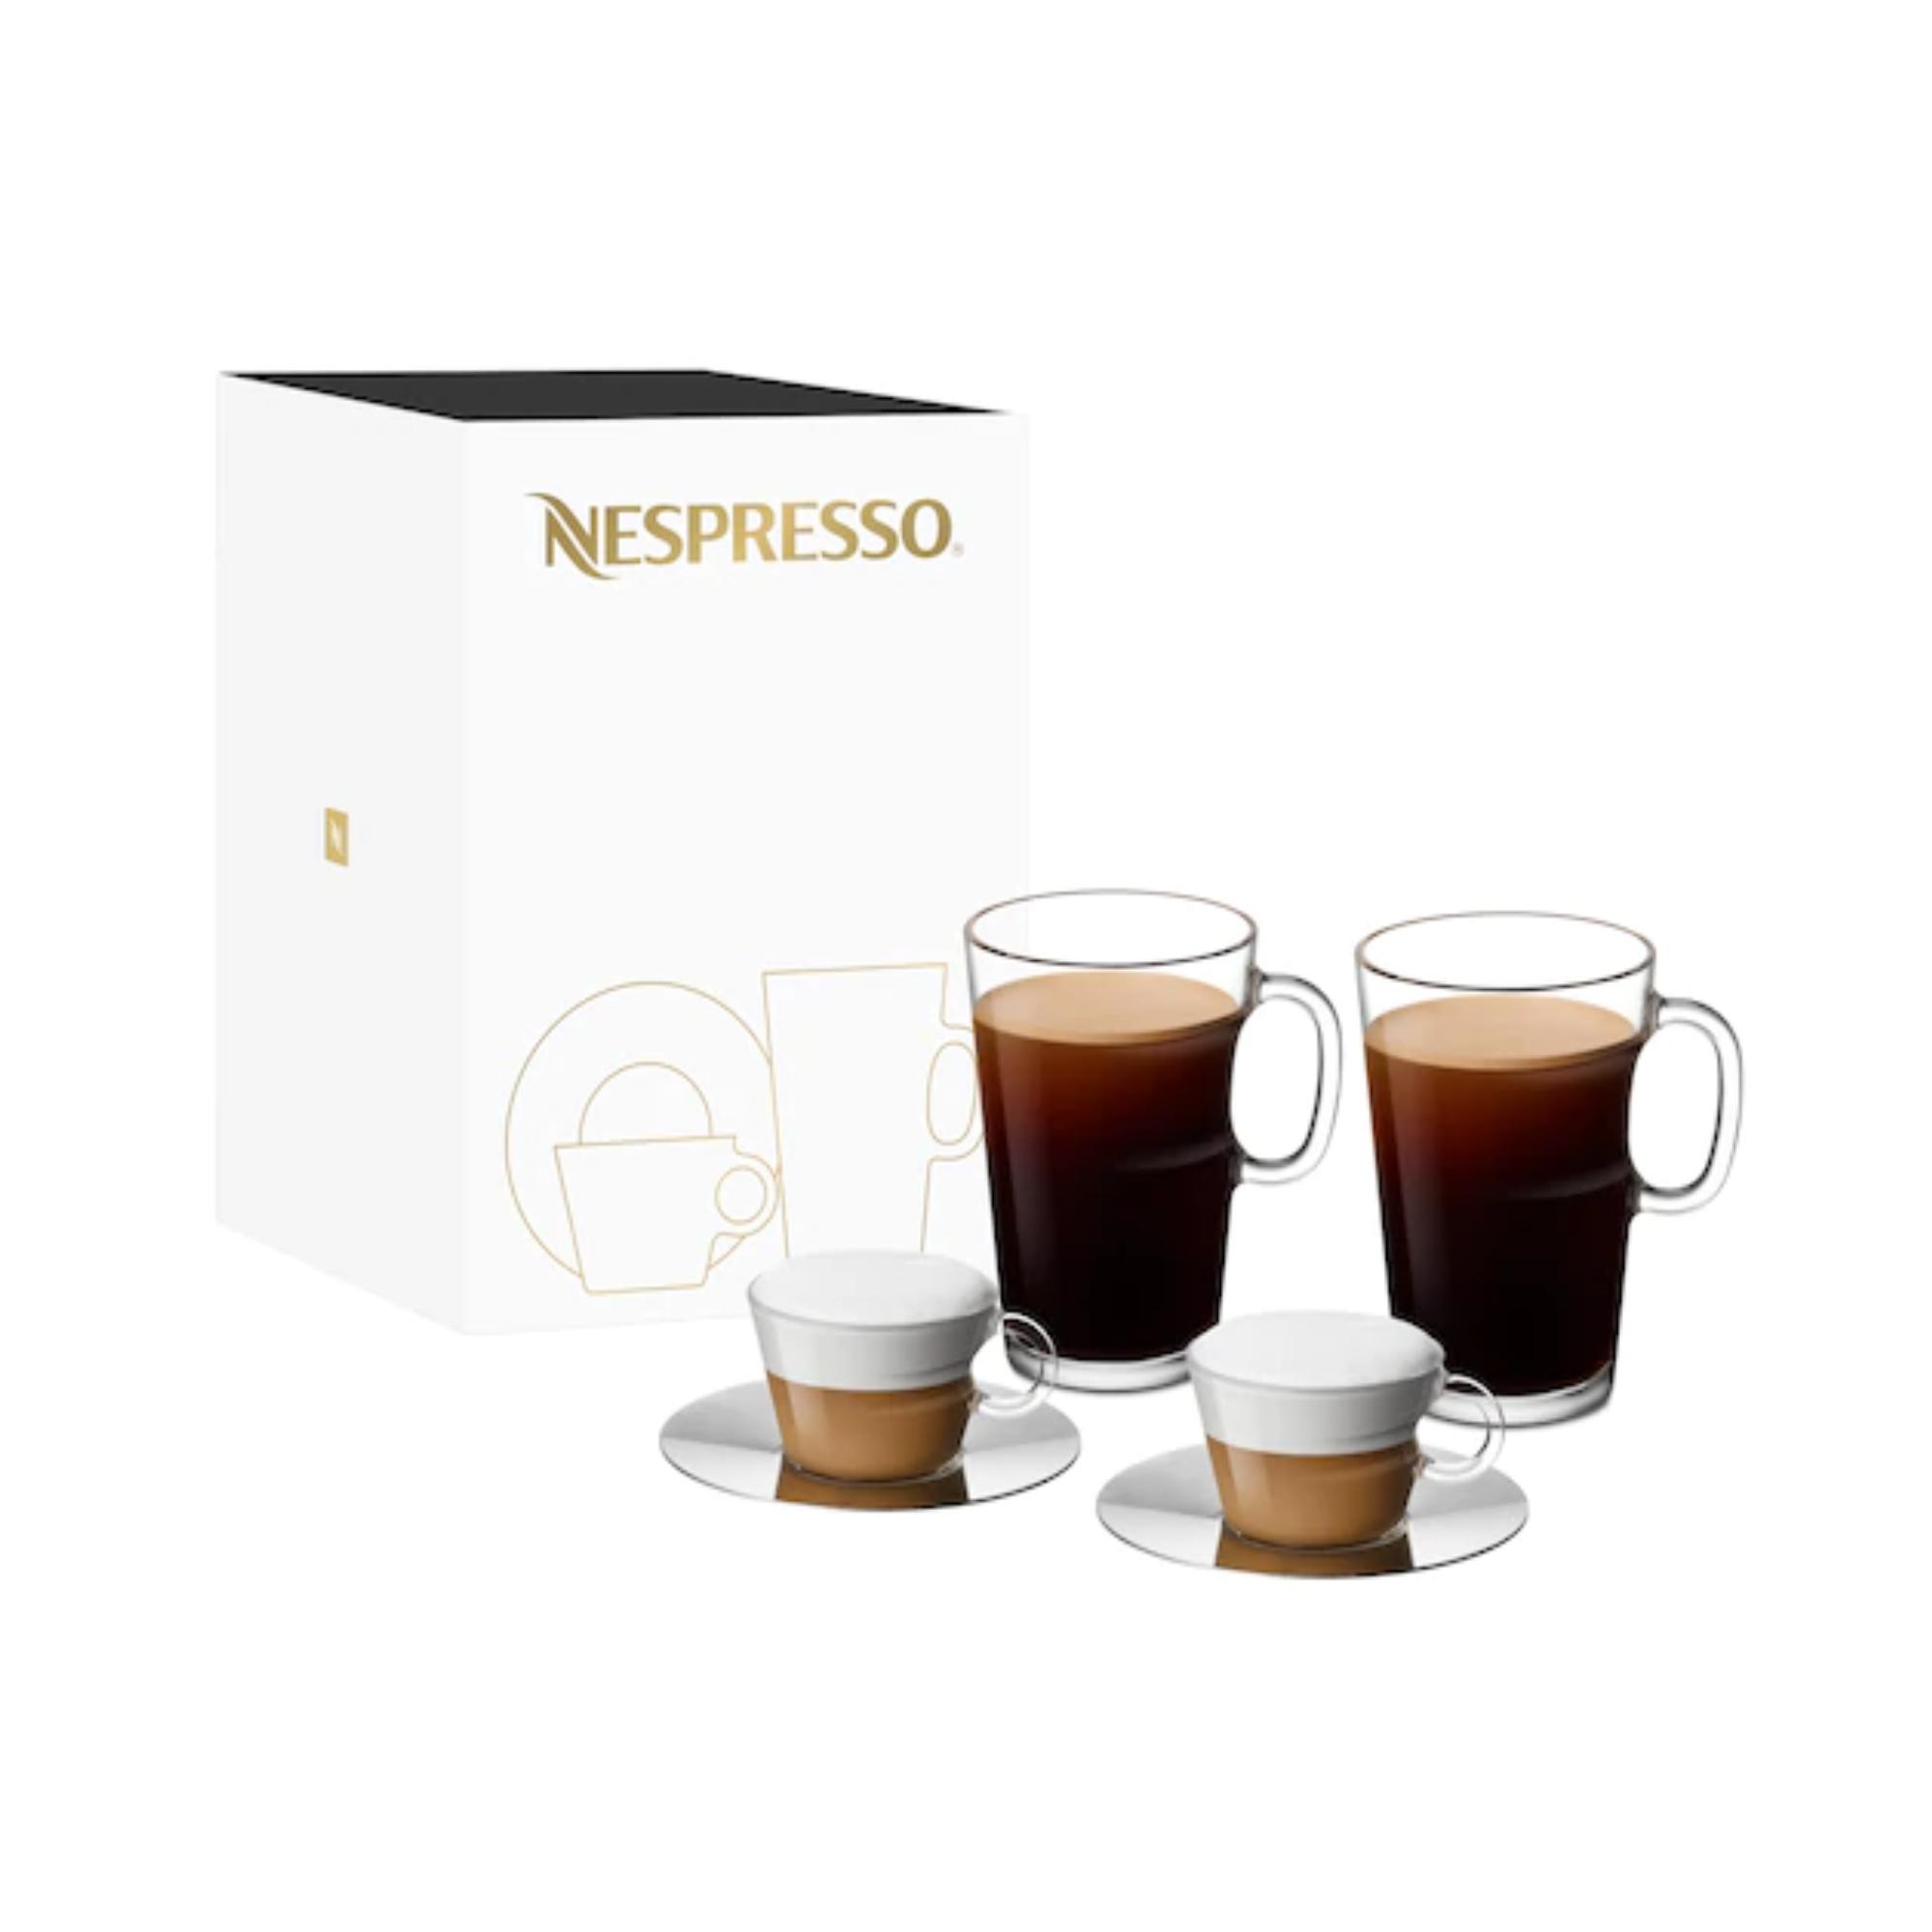 Nespresso VIEW Coffee Mugs (270ml) and Cappuccino Cups ...